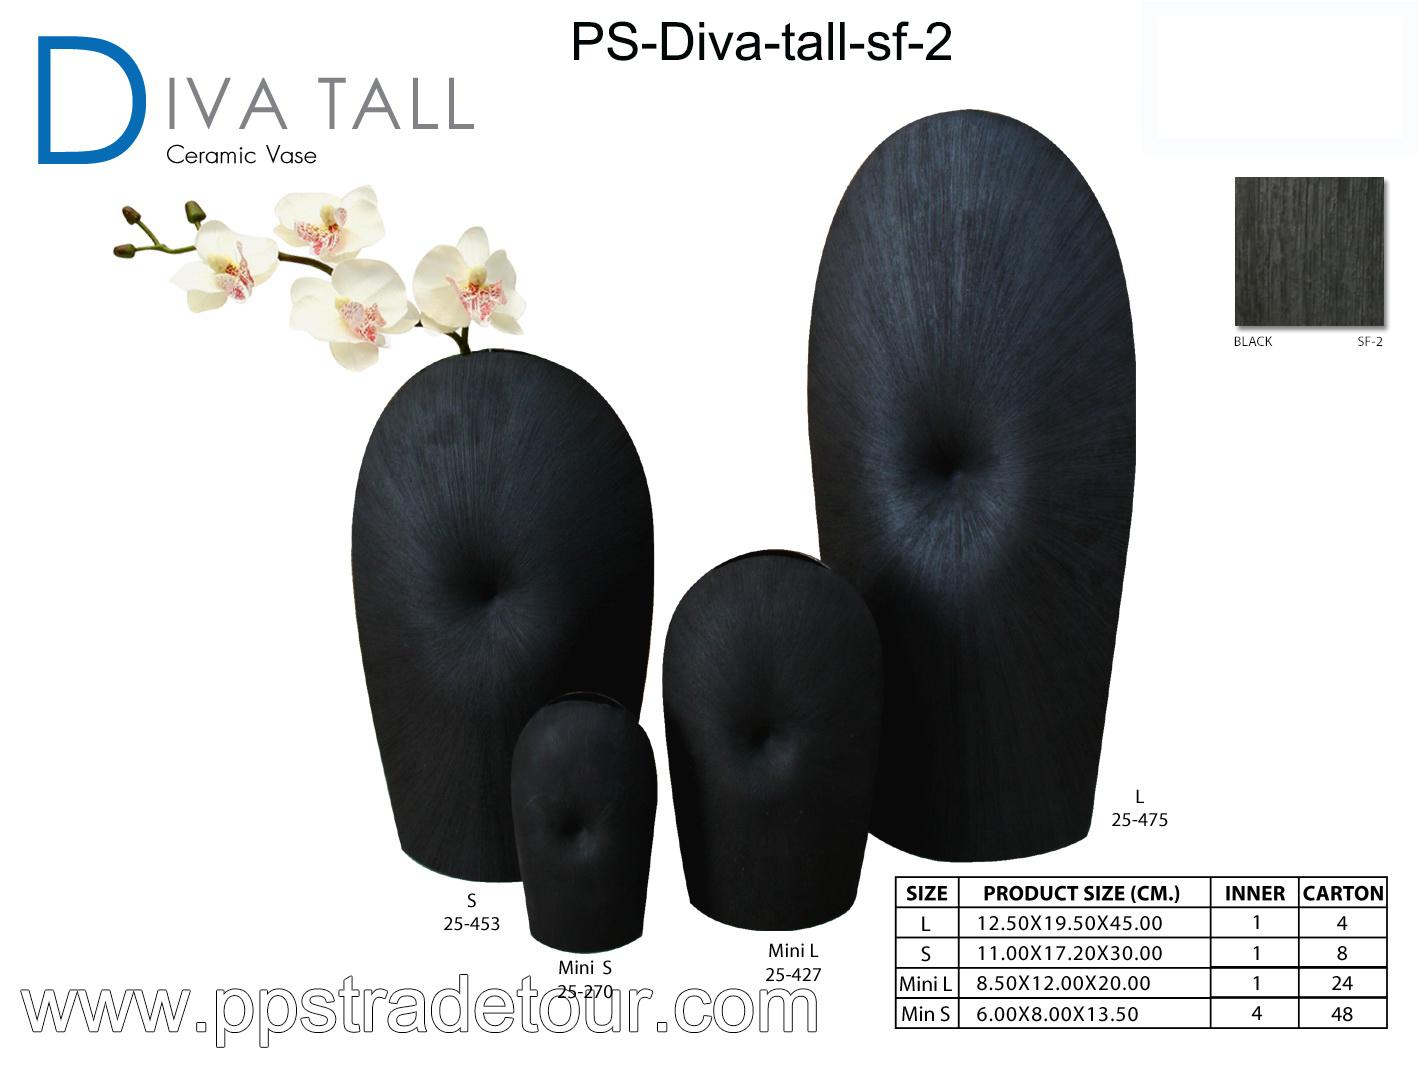 PSCV-Diva-Tall_SF-2